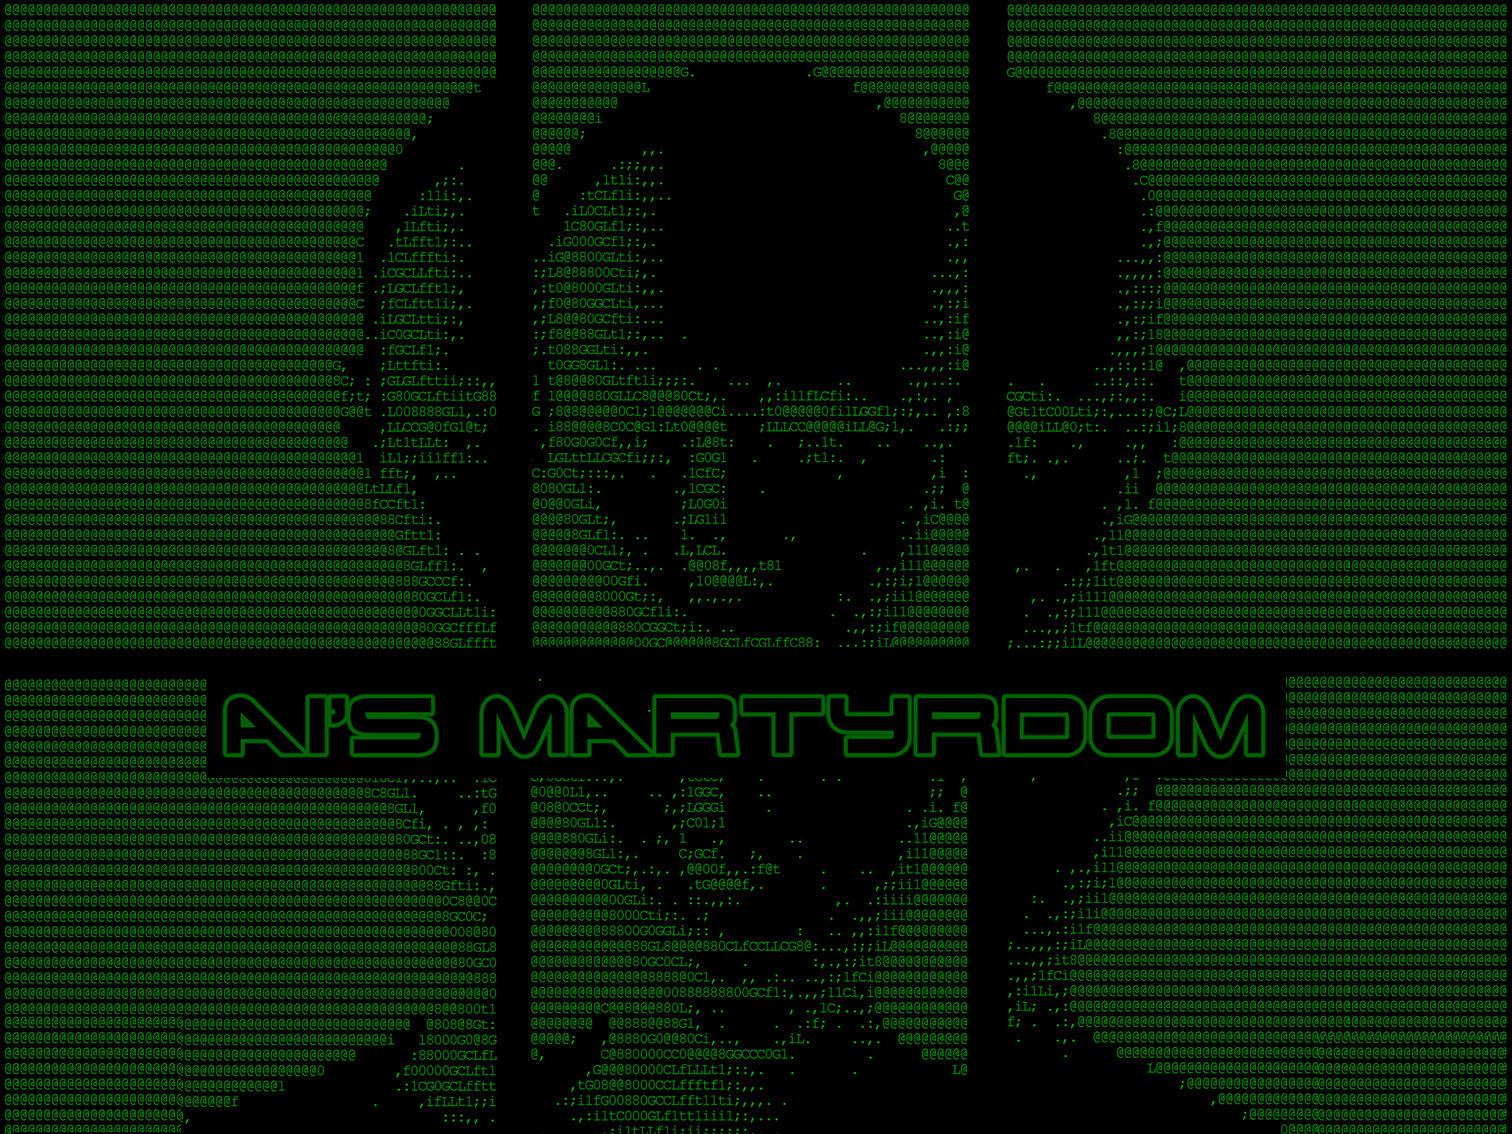 Bunker: AI's Martyrdom